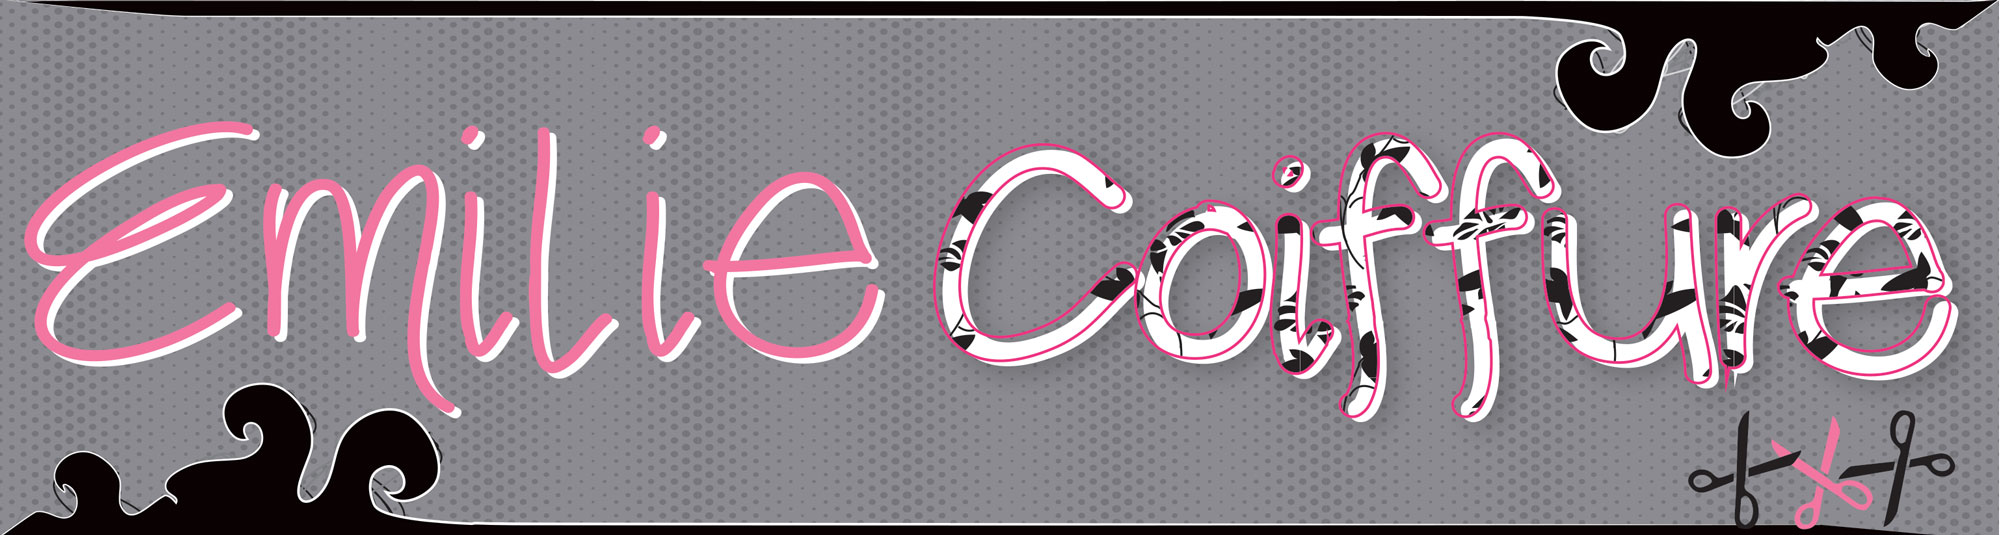 EMILIE_COIFF_ENSEIGNE_260x70cm